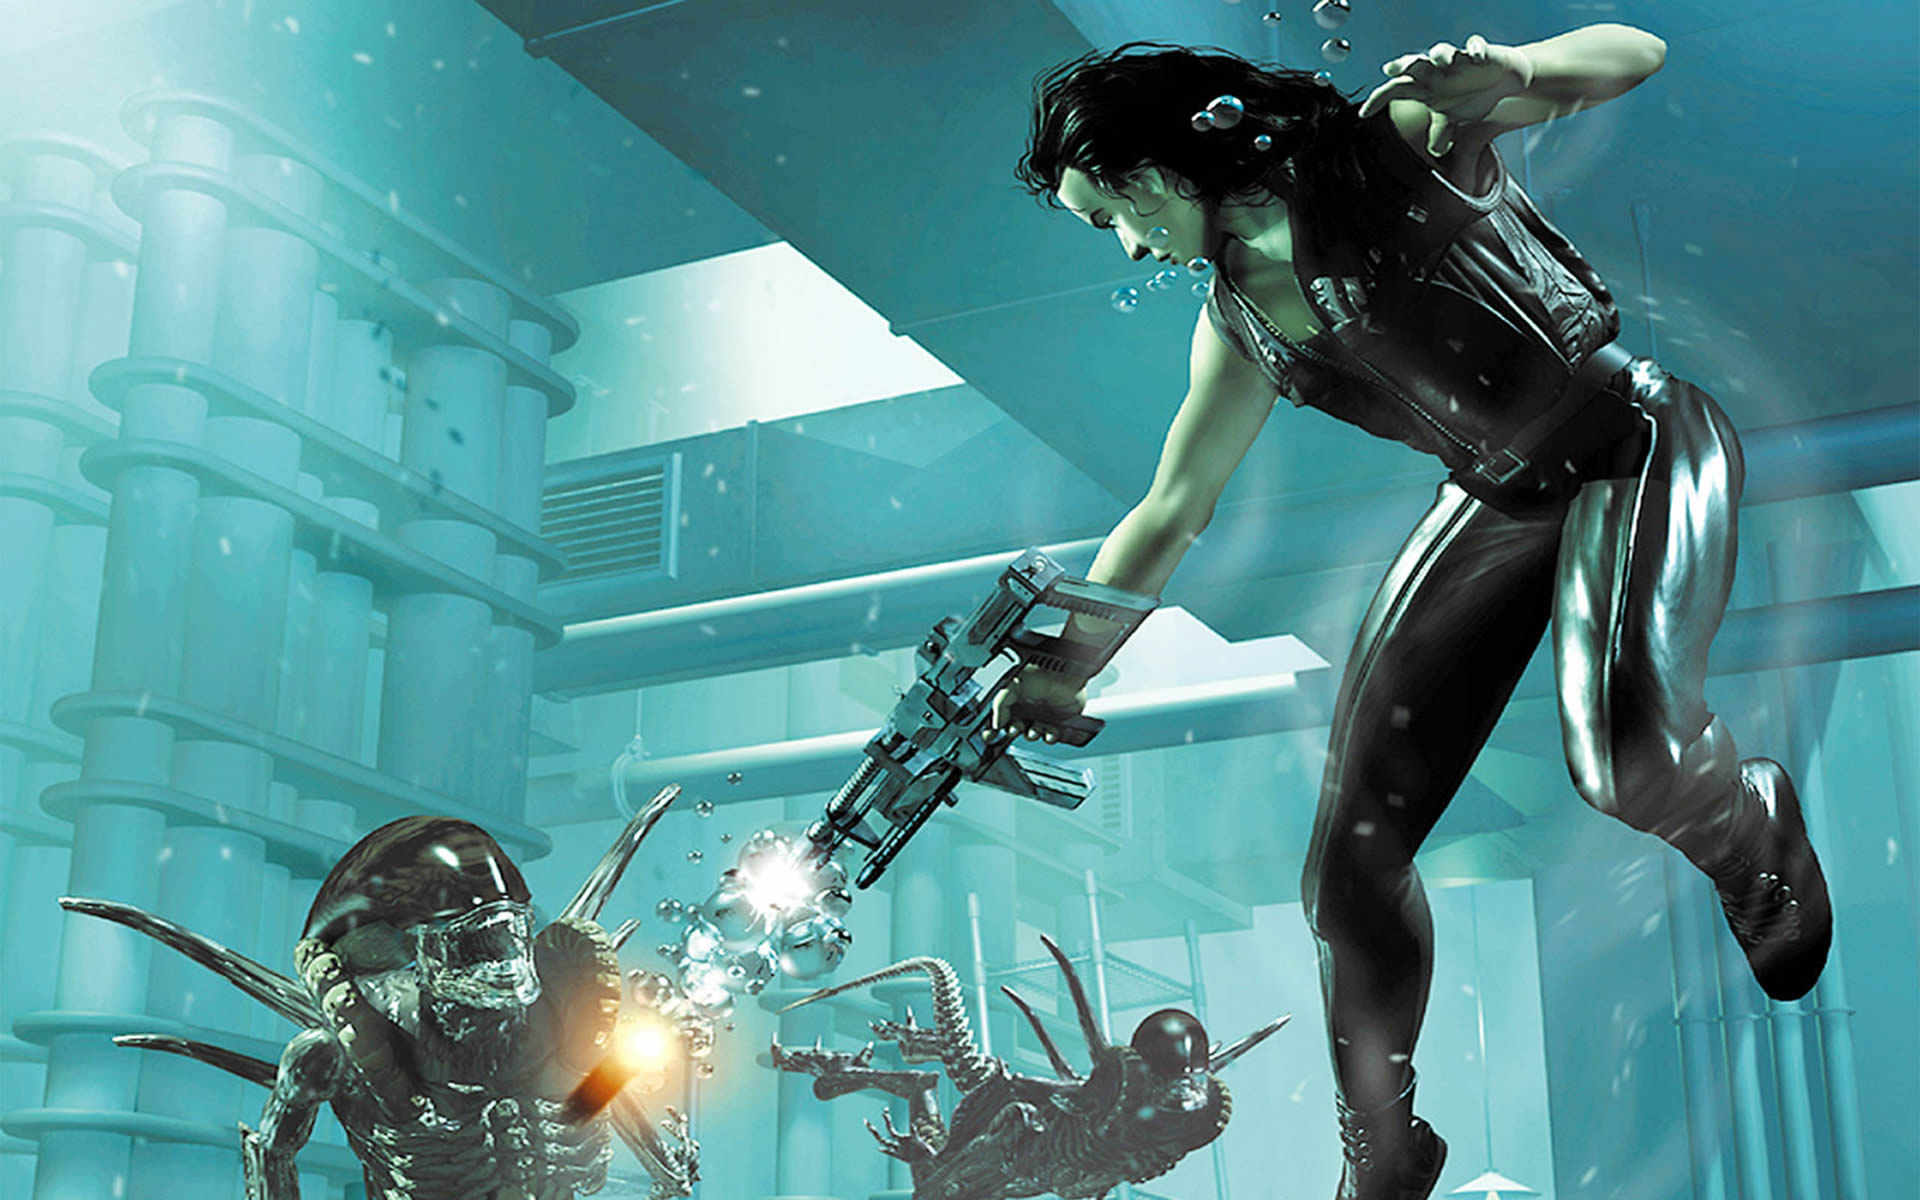 Alien Resurrection Underwater Alien Attack 1920x1200